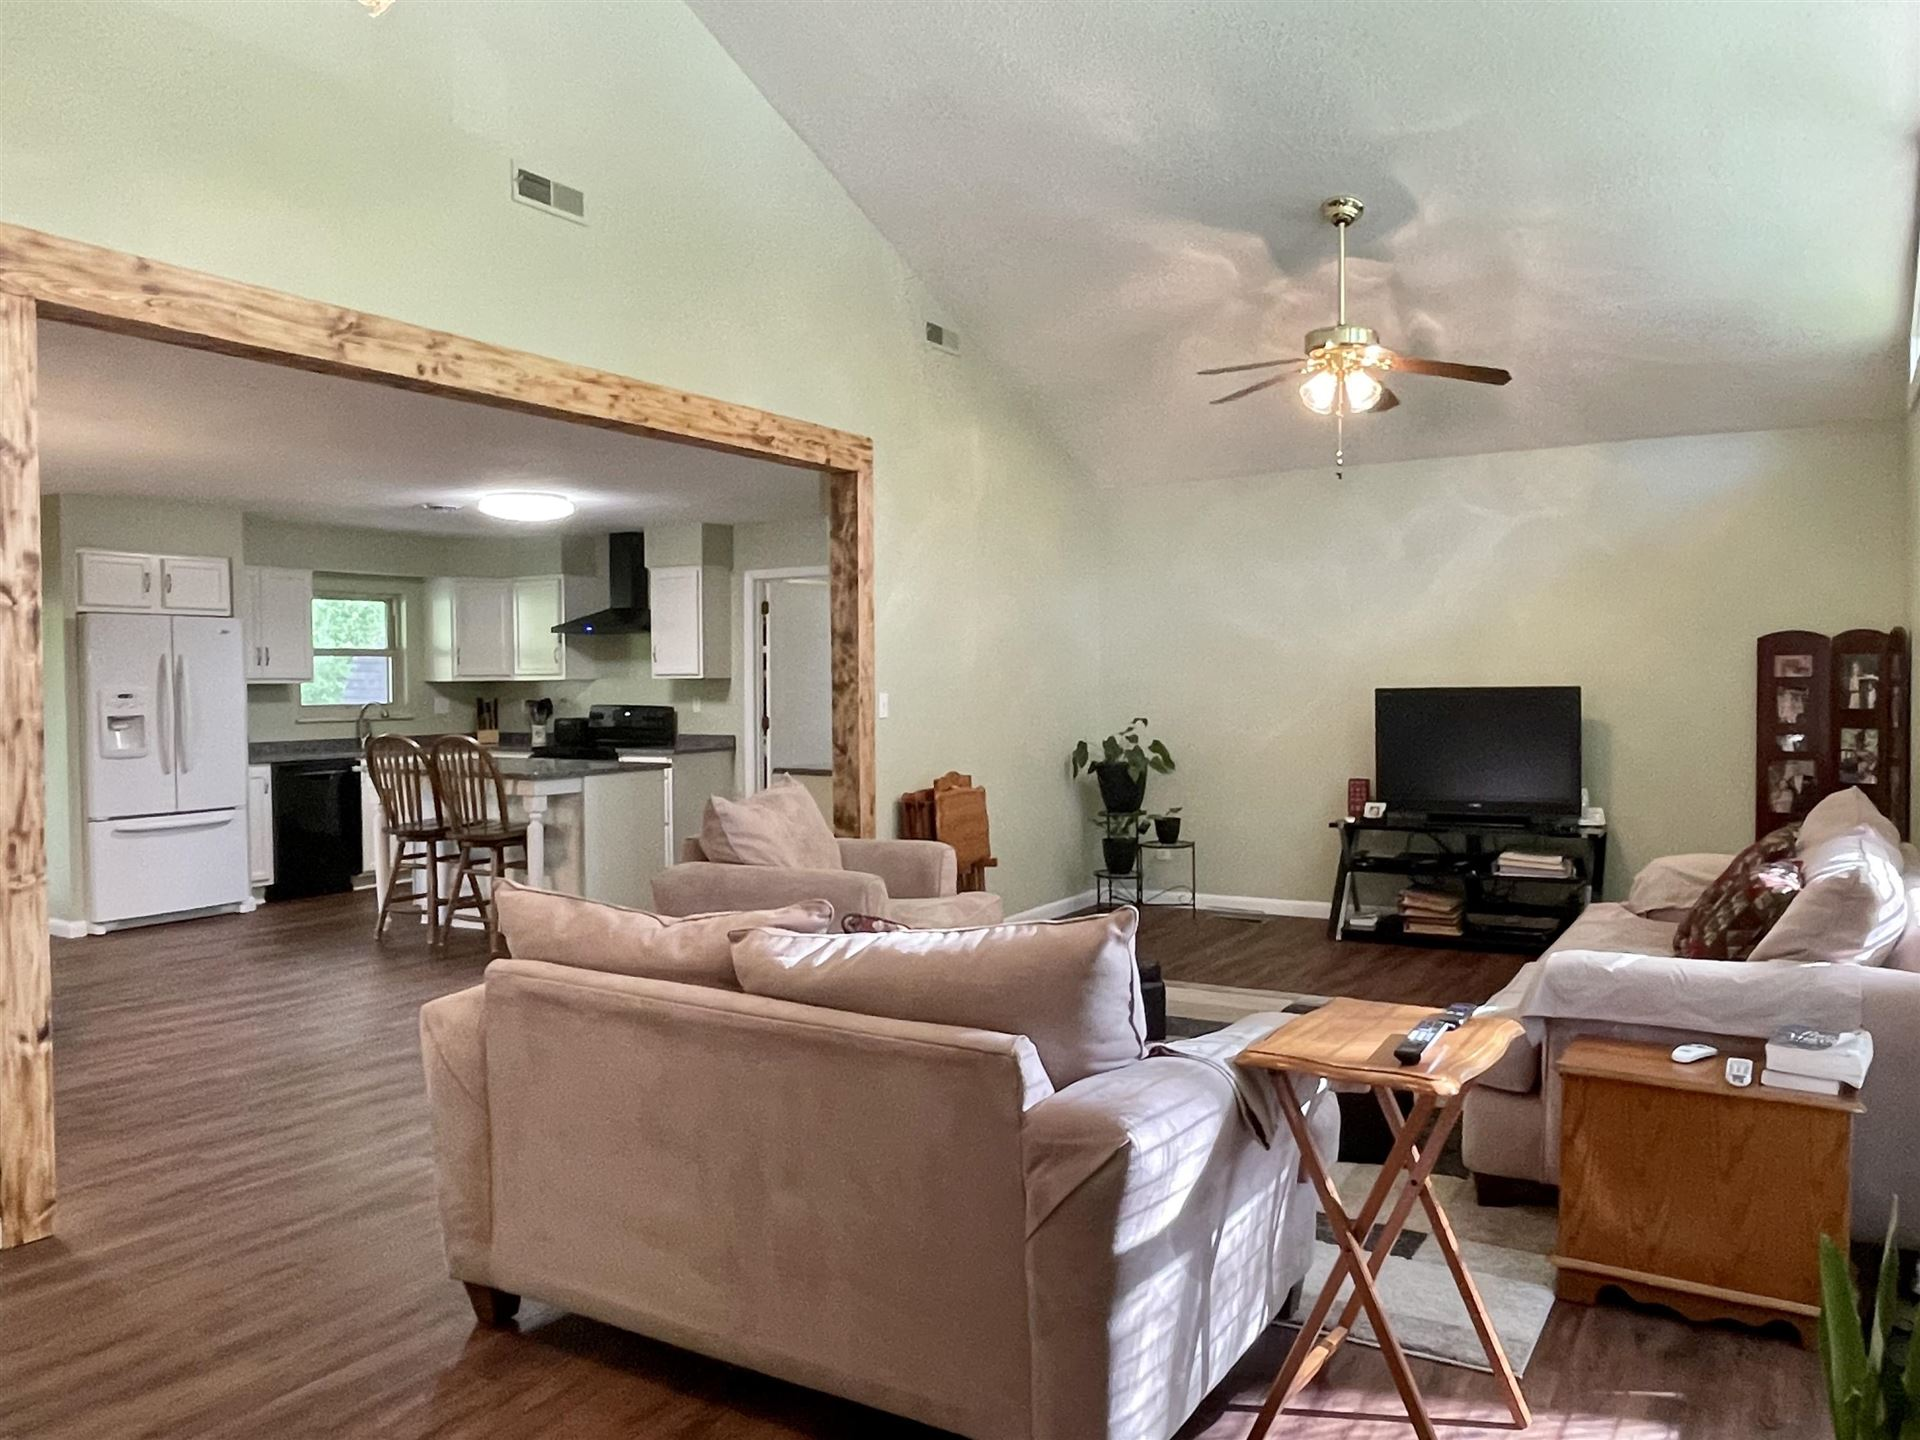 Photo of 130 Culver Rd, Oak Ridge, TN 37830 (MLS # 1160609)